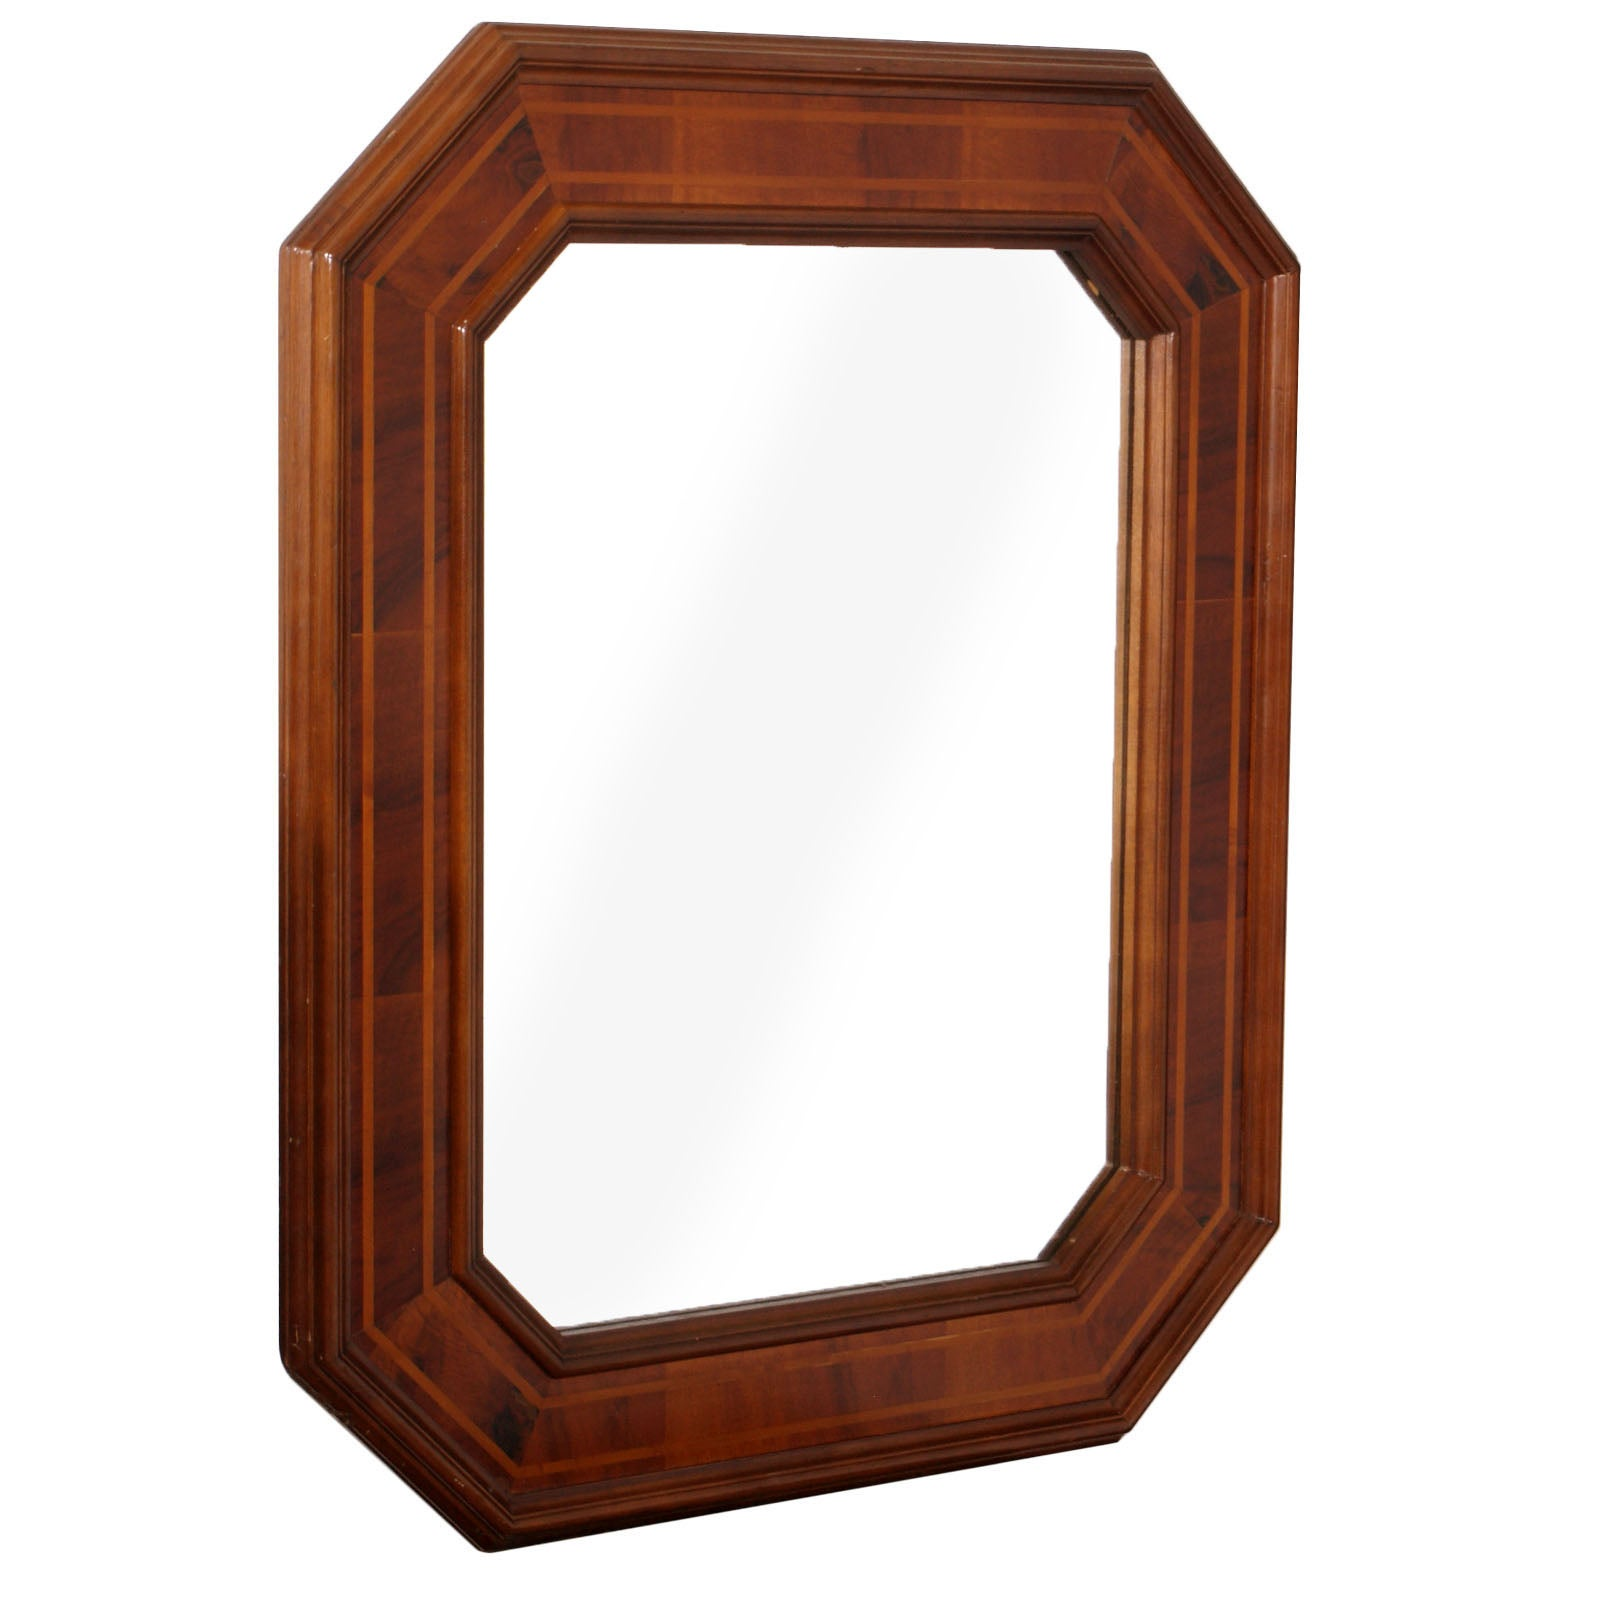 Mid Century Modern Mirror With Octagonal Frame In Walnut